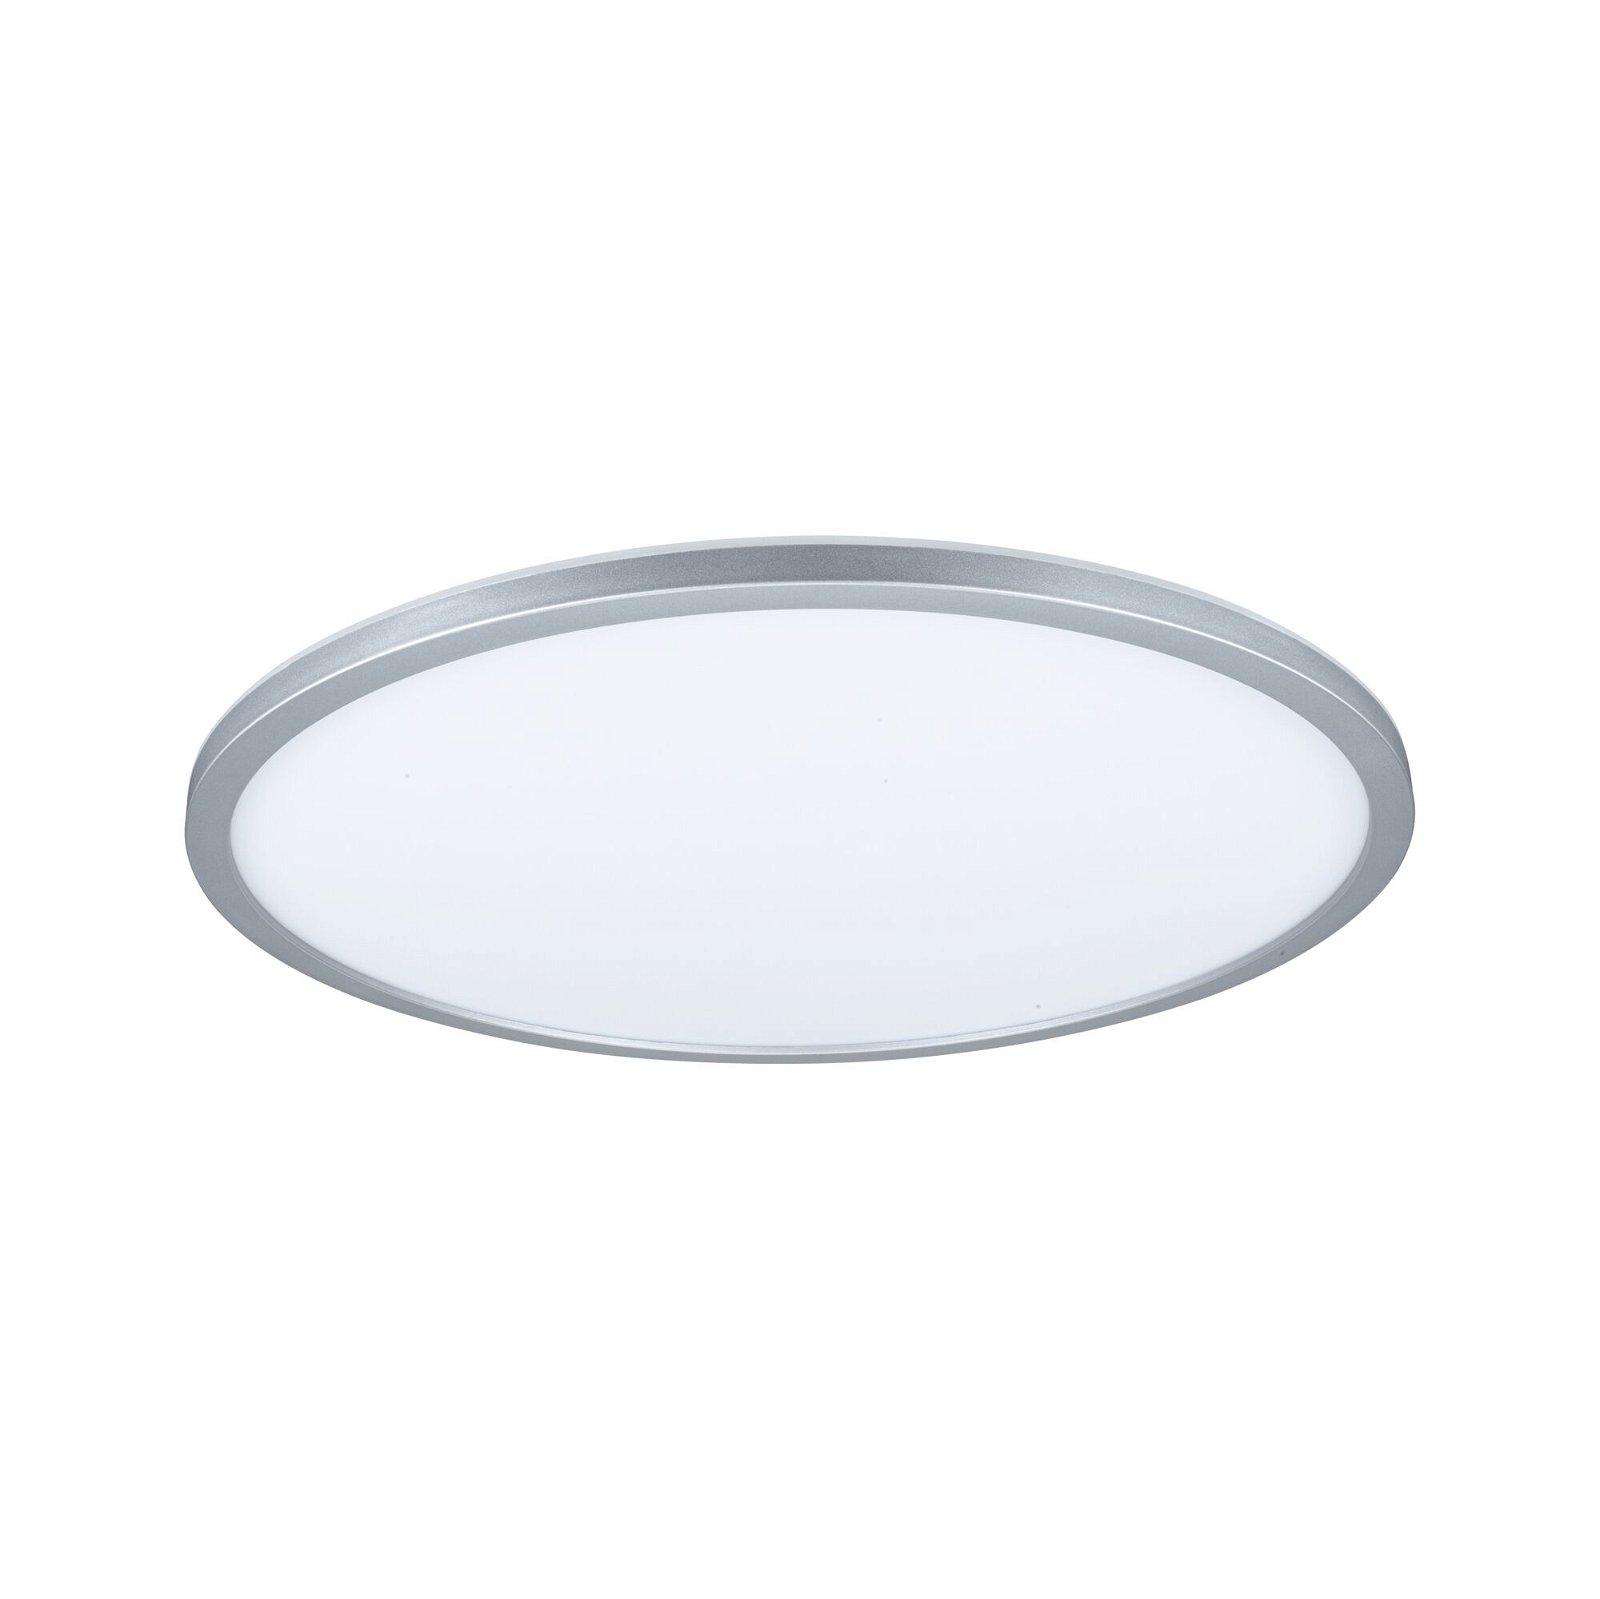 Panneau LED 3-Step-Dim Atria Shine rond 420mm 2800lm 3000K Chrome mat